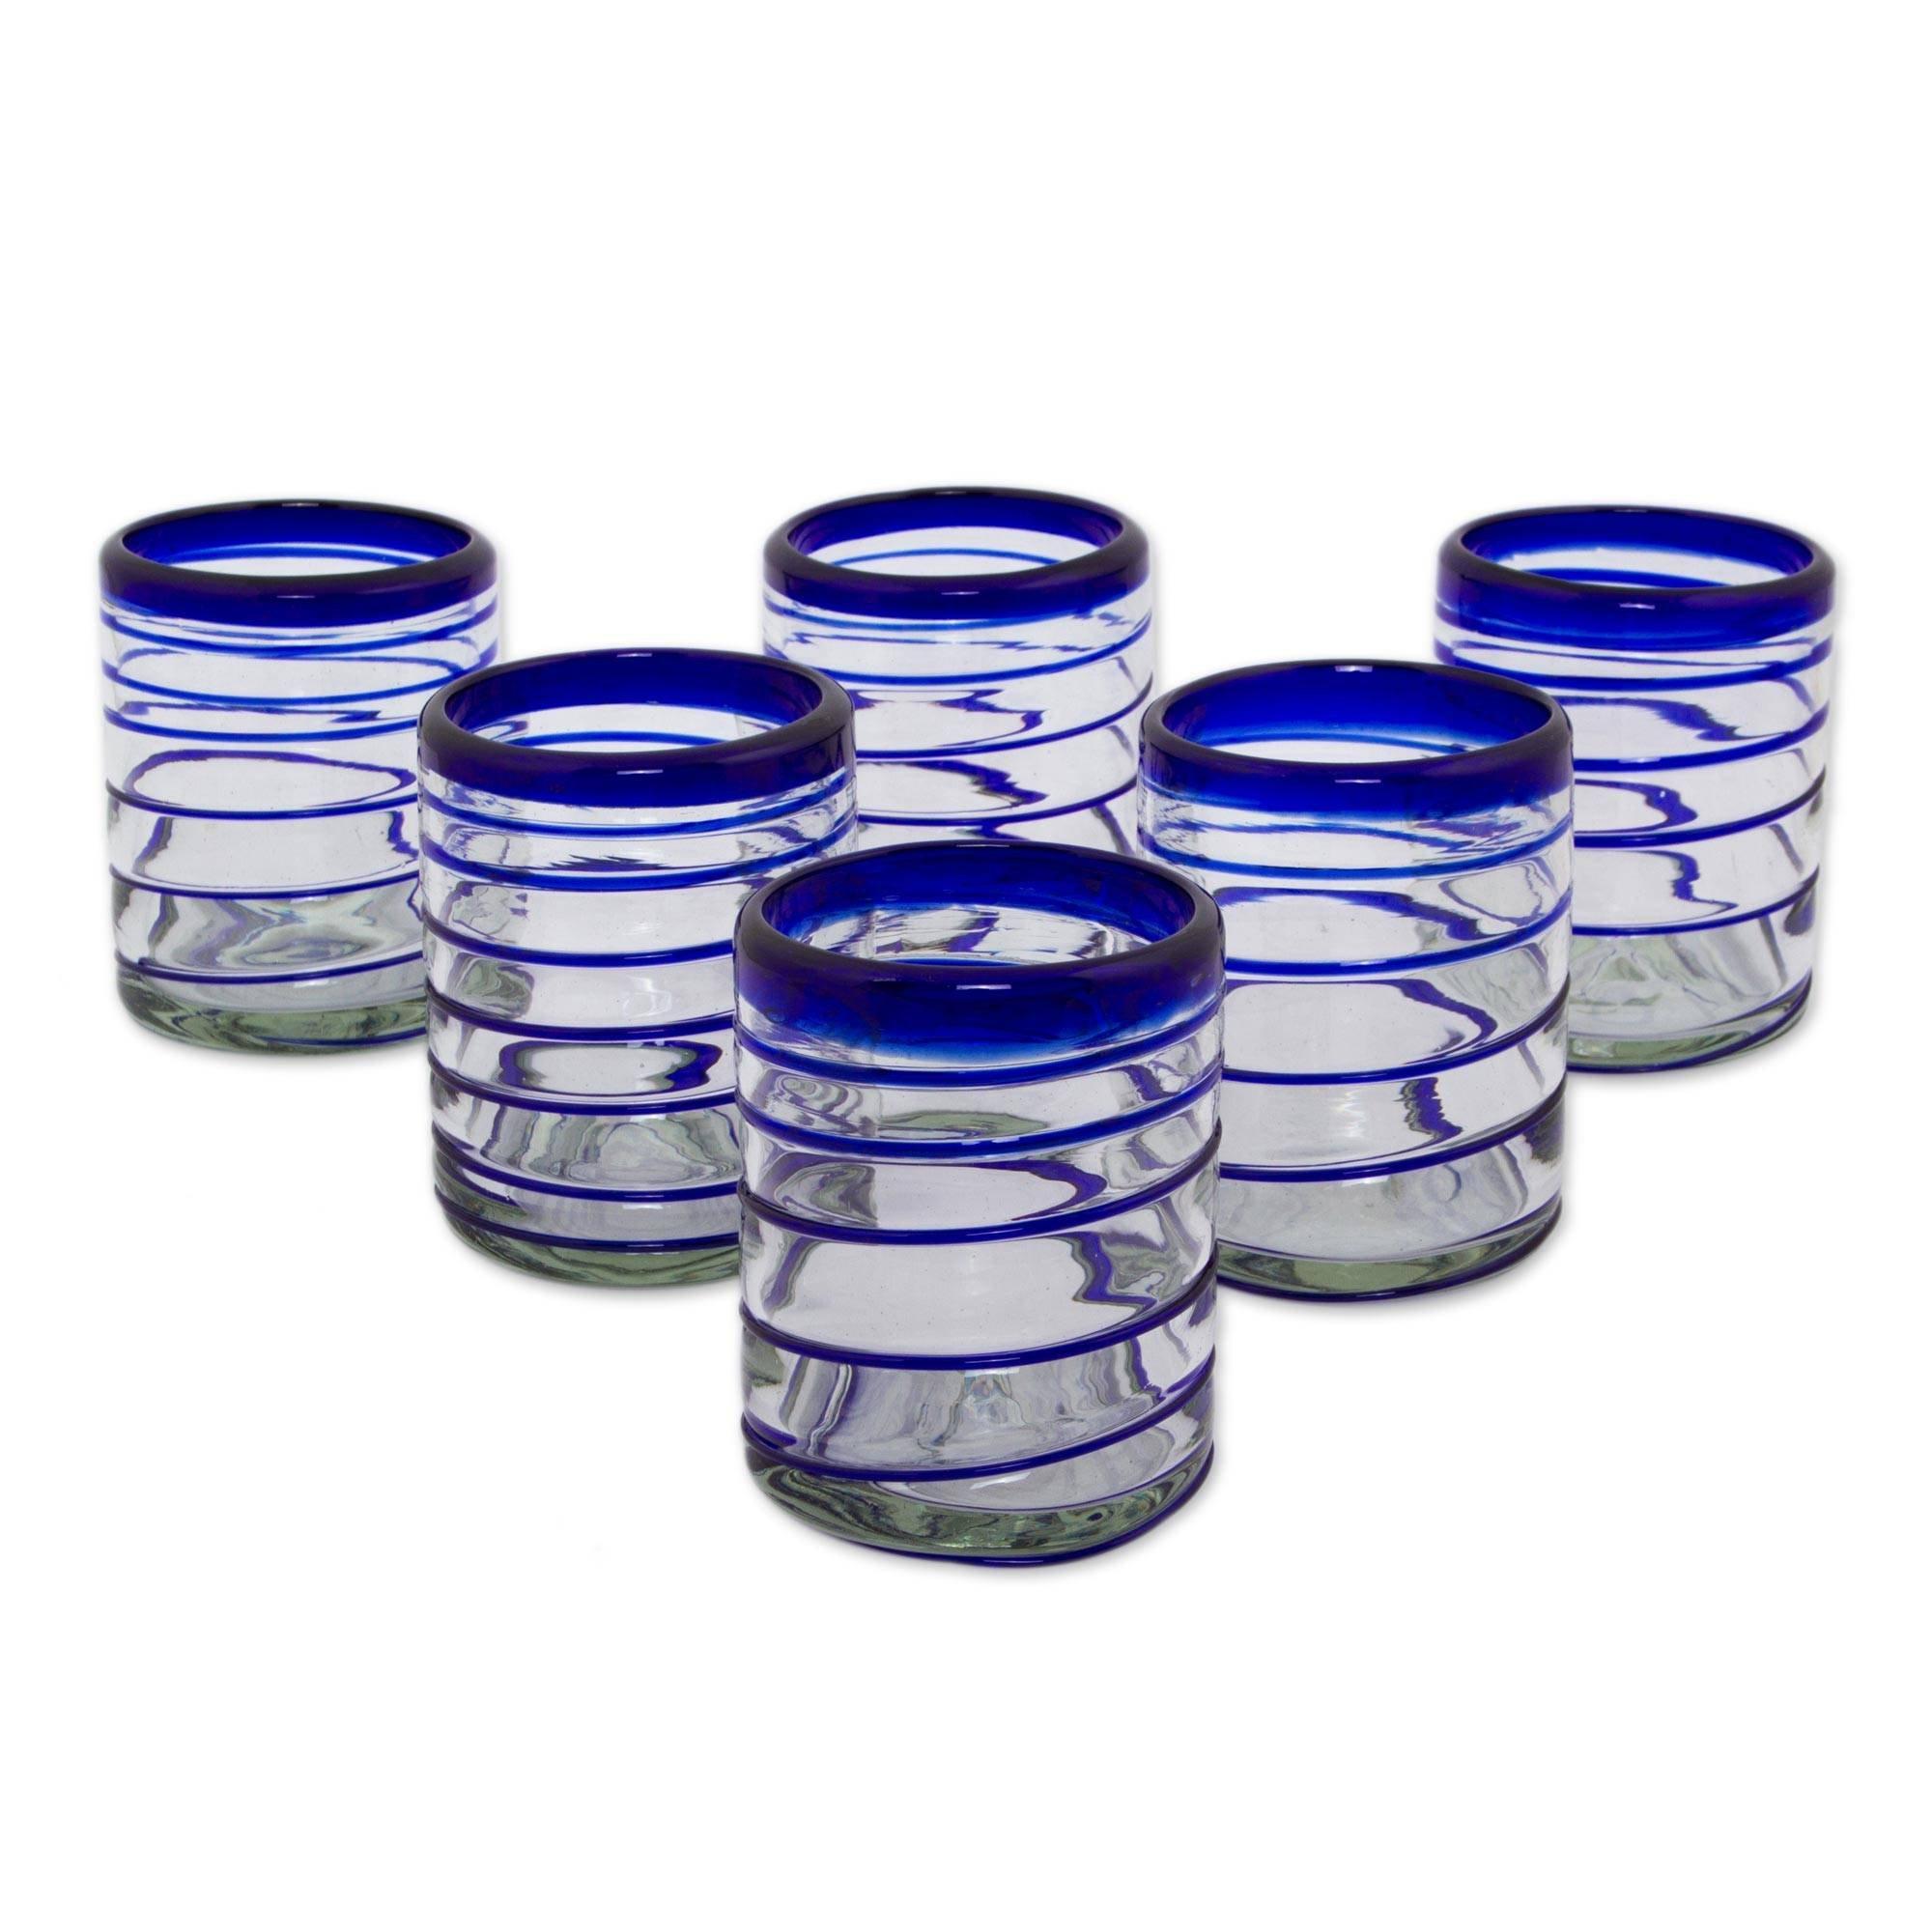 NOVICA Blue Clear Glass Hand Blown Cocktail Glasses, 11 oz, Cobalt Spiral' (set of 6)